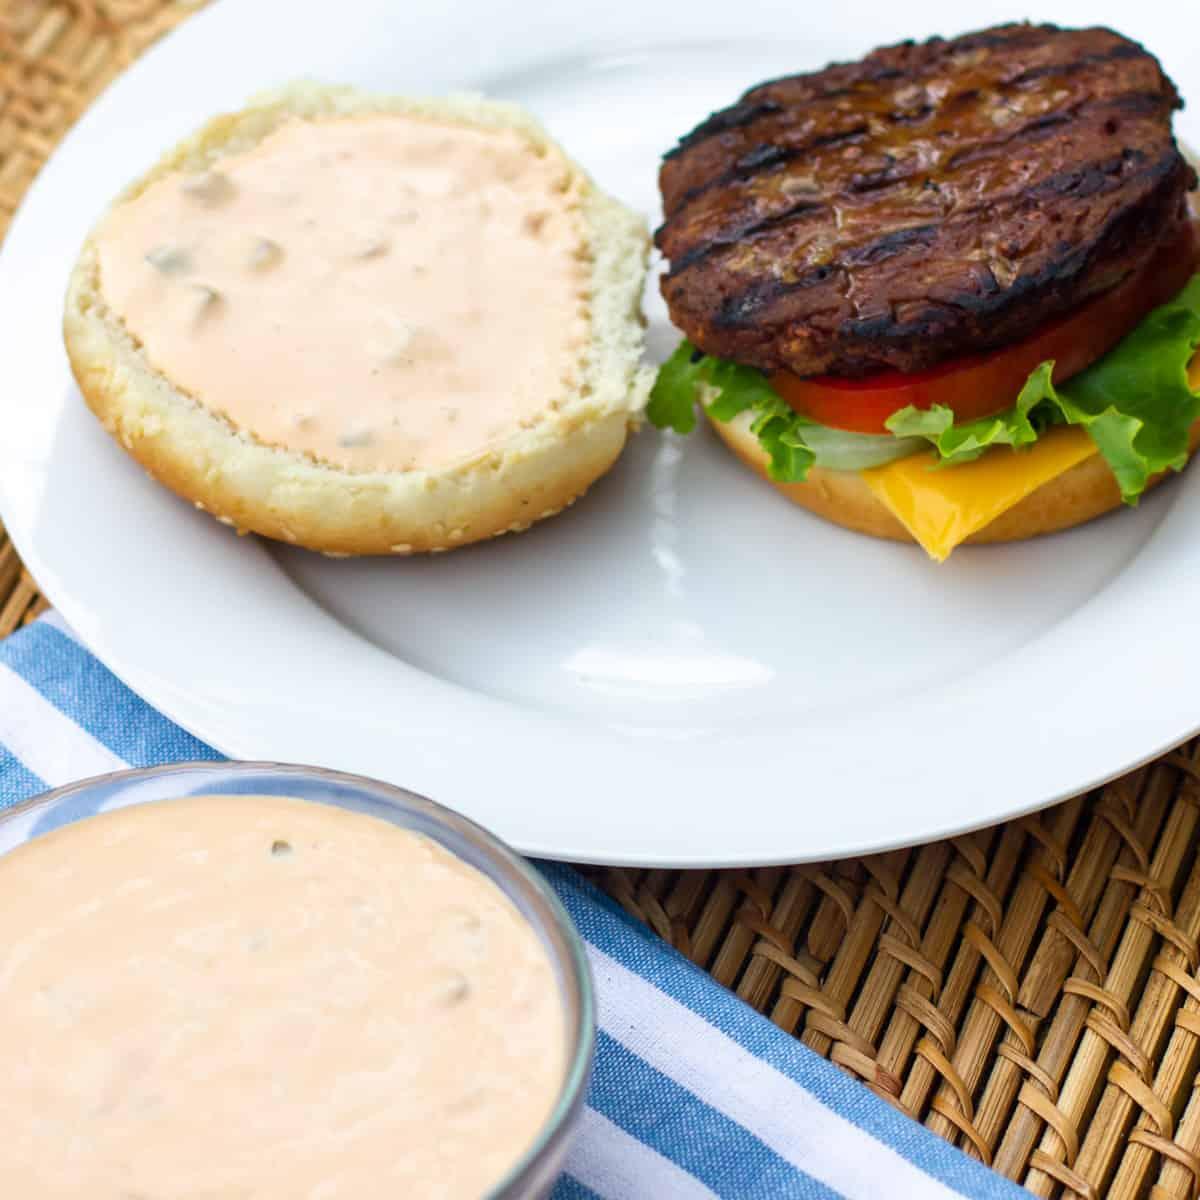 Make Big Mac burger sauce at home with the secret copycat recipe!